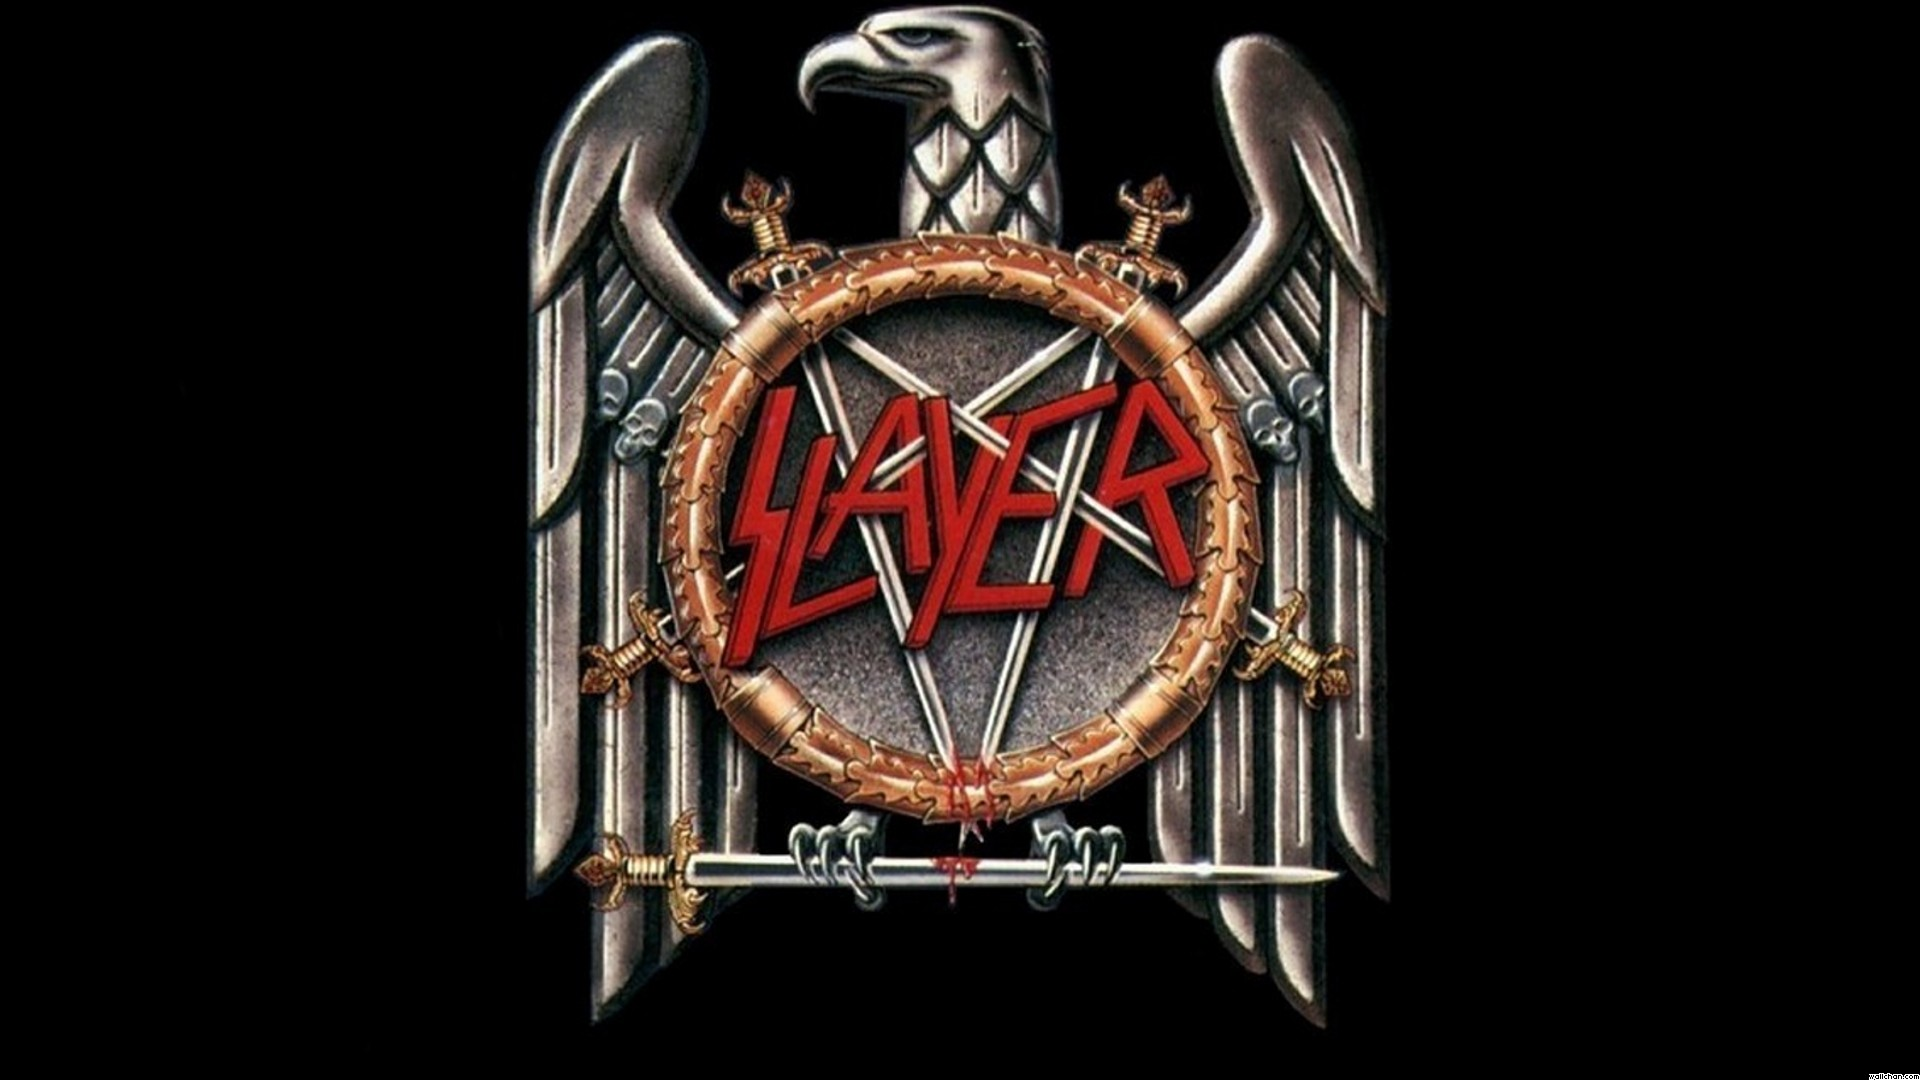 HD Slayer Band Wallpapers.